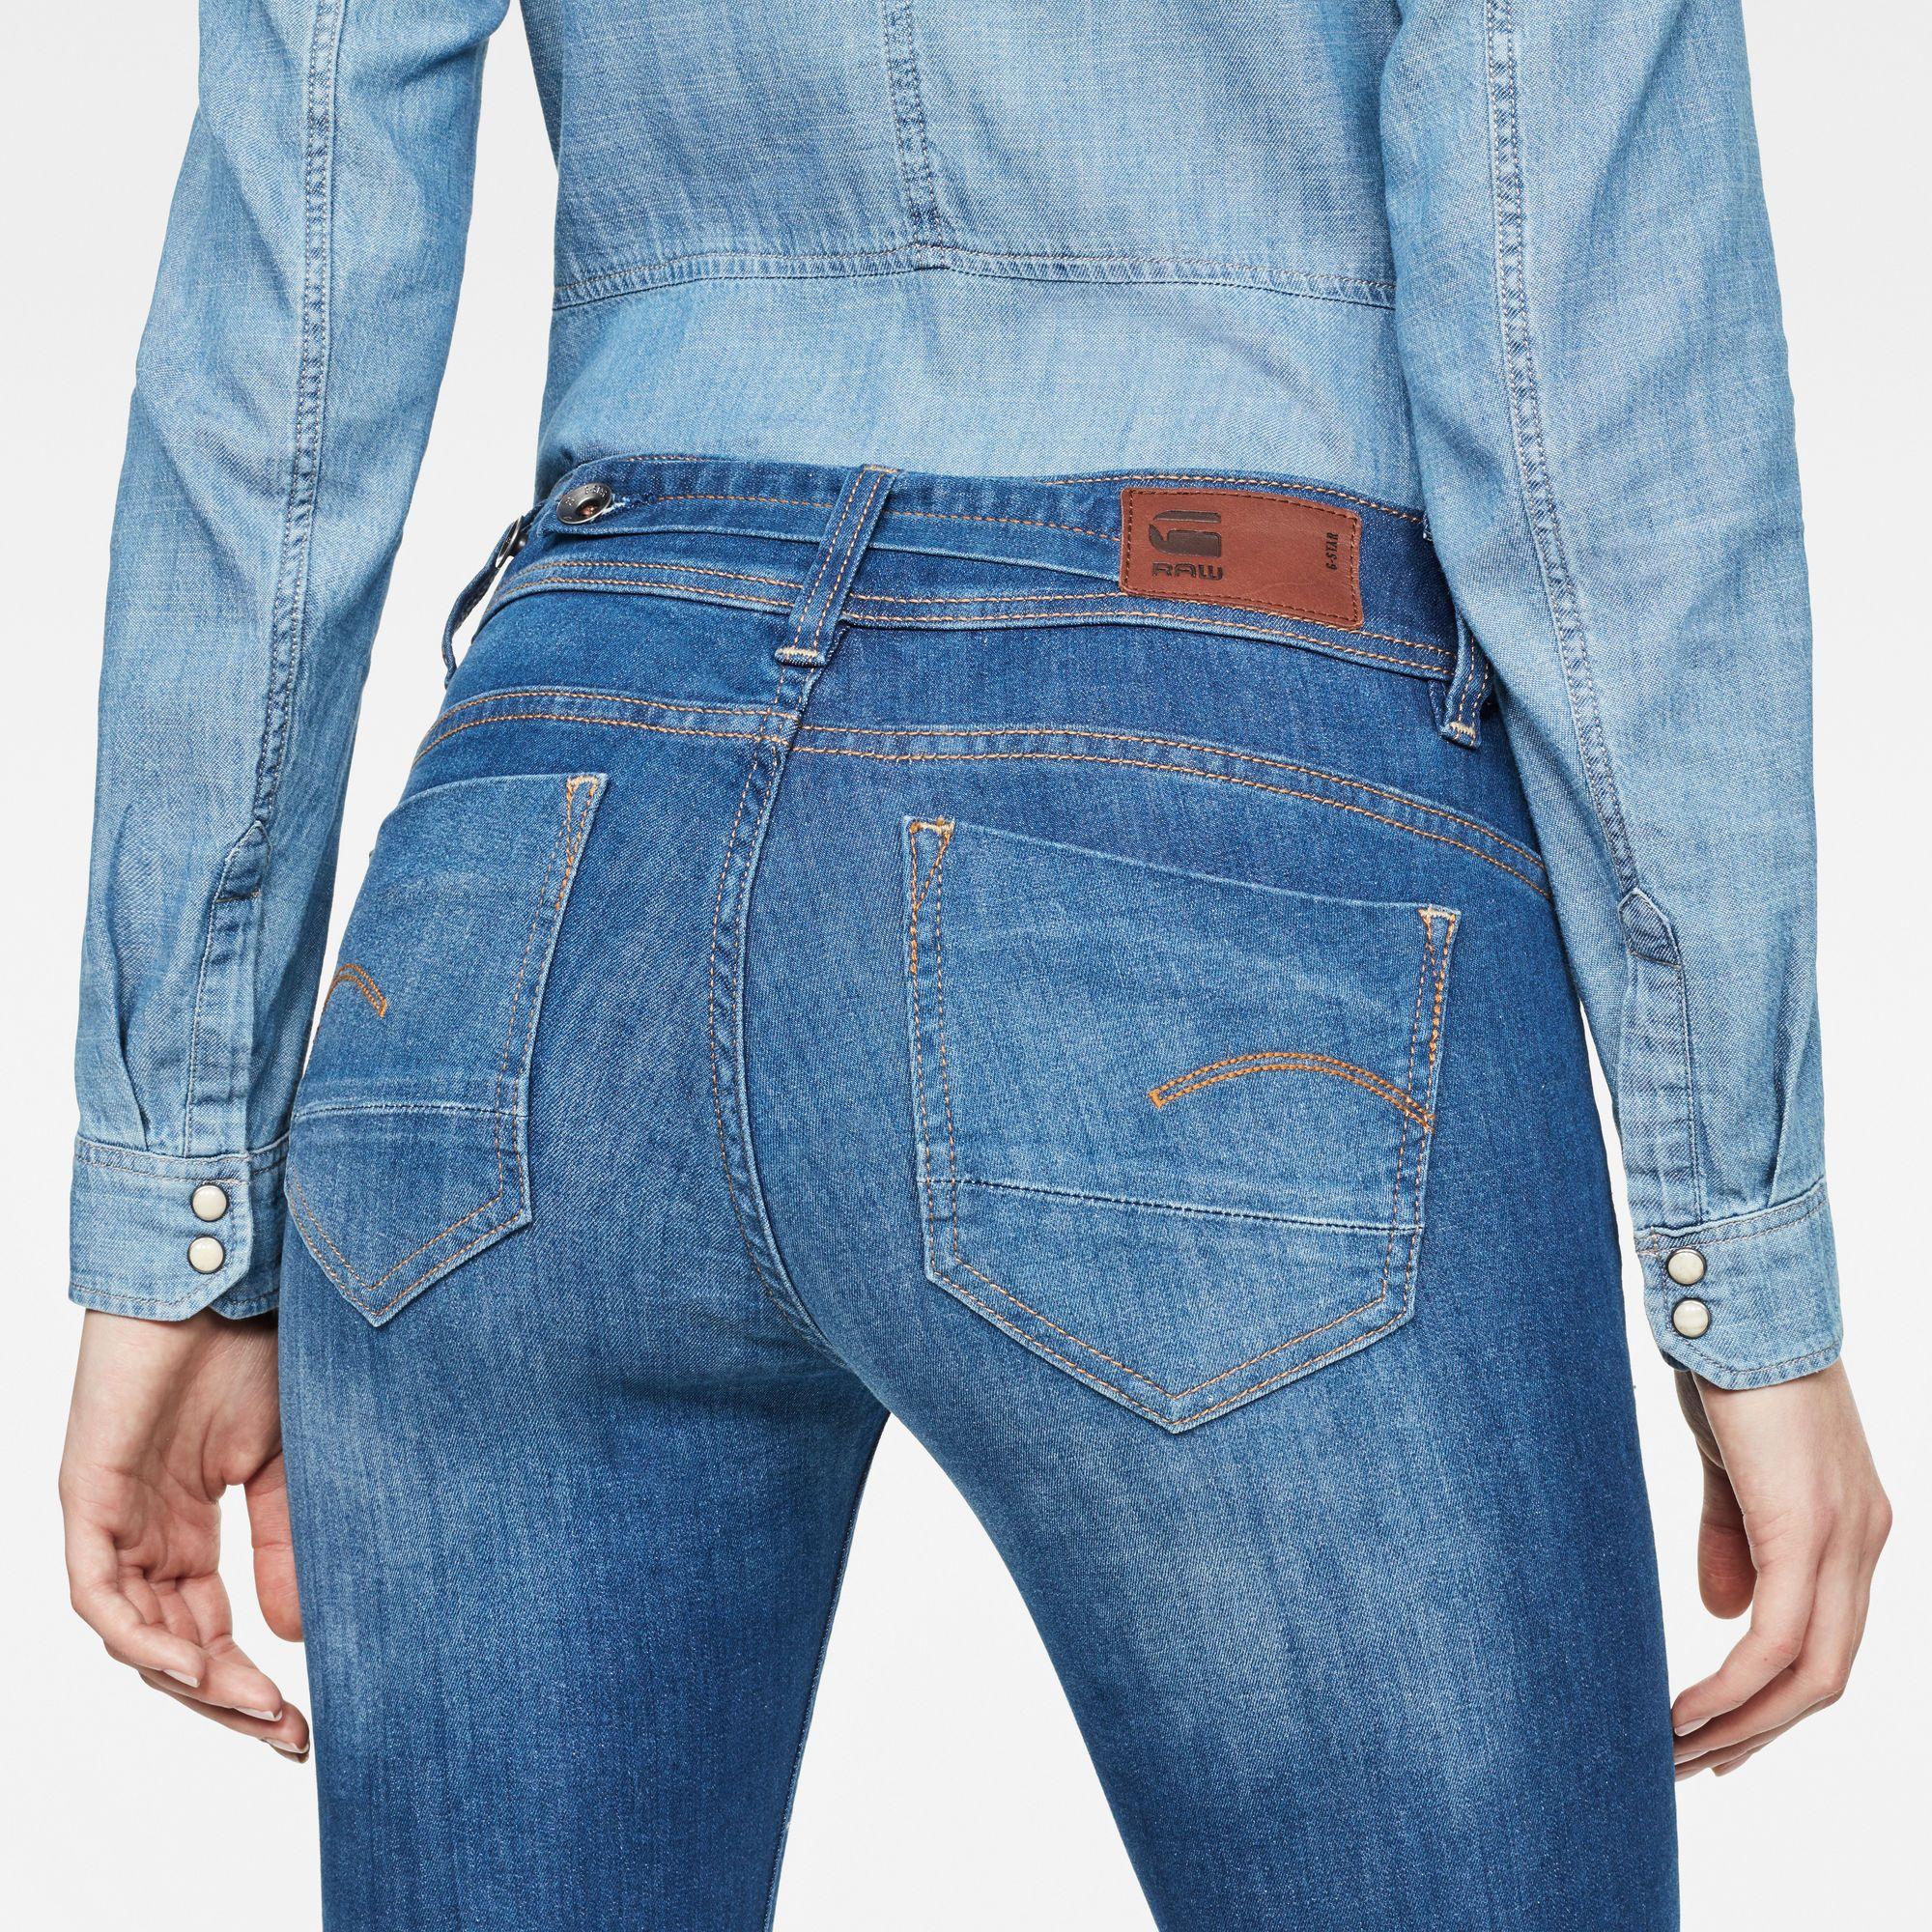 G-Star RAW Midge Saddle Mid Waist Straight Jeans